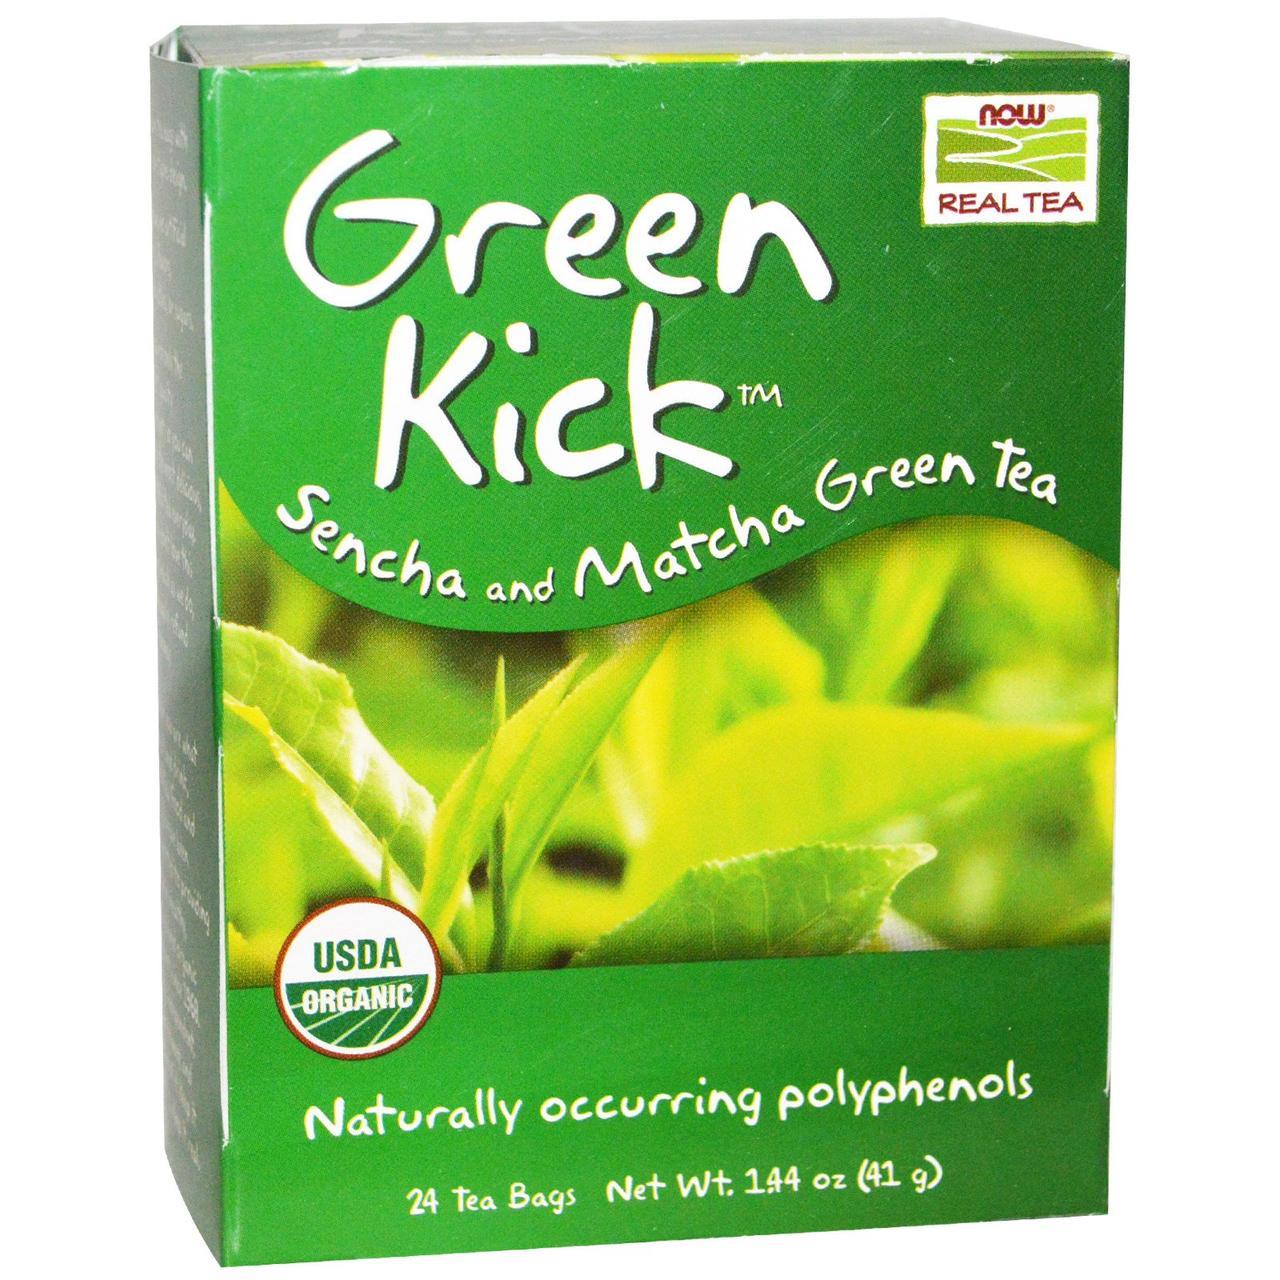 Чай Сенча і Матчу, Now Foods, 24 пак.(41 р.)